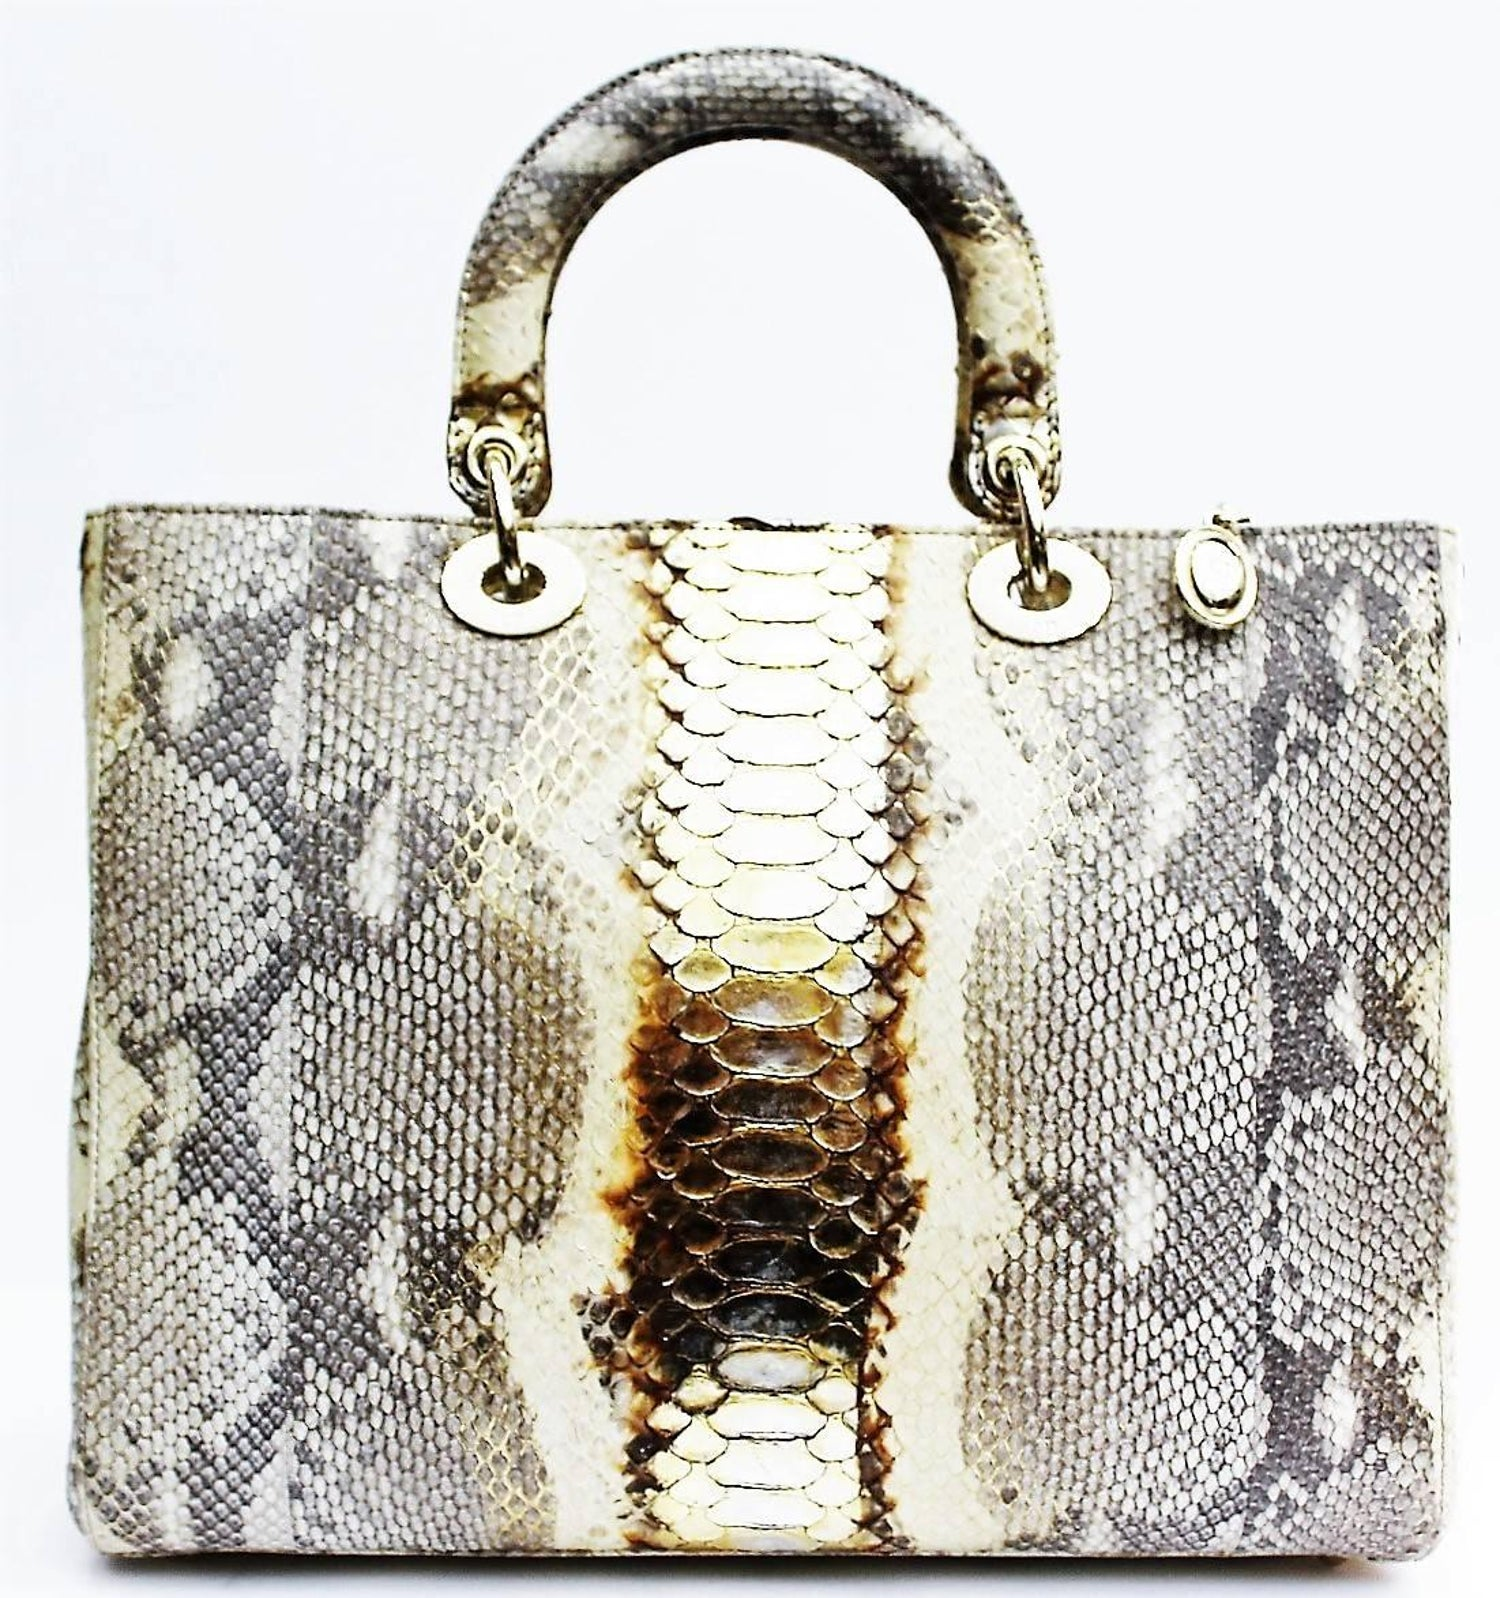 6a07d1c0d7 Christian Dior Lady Dior Large Python Bag at 1stdibs